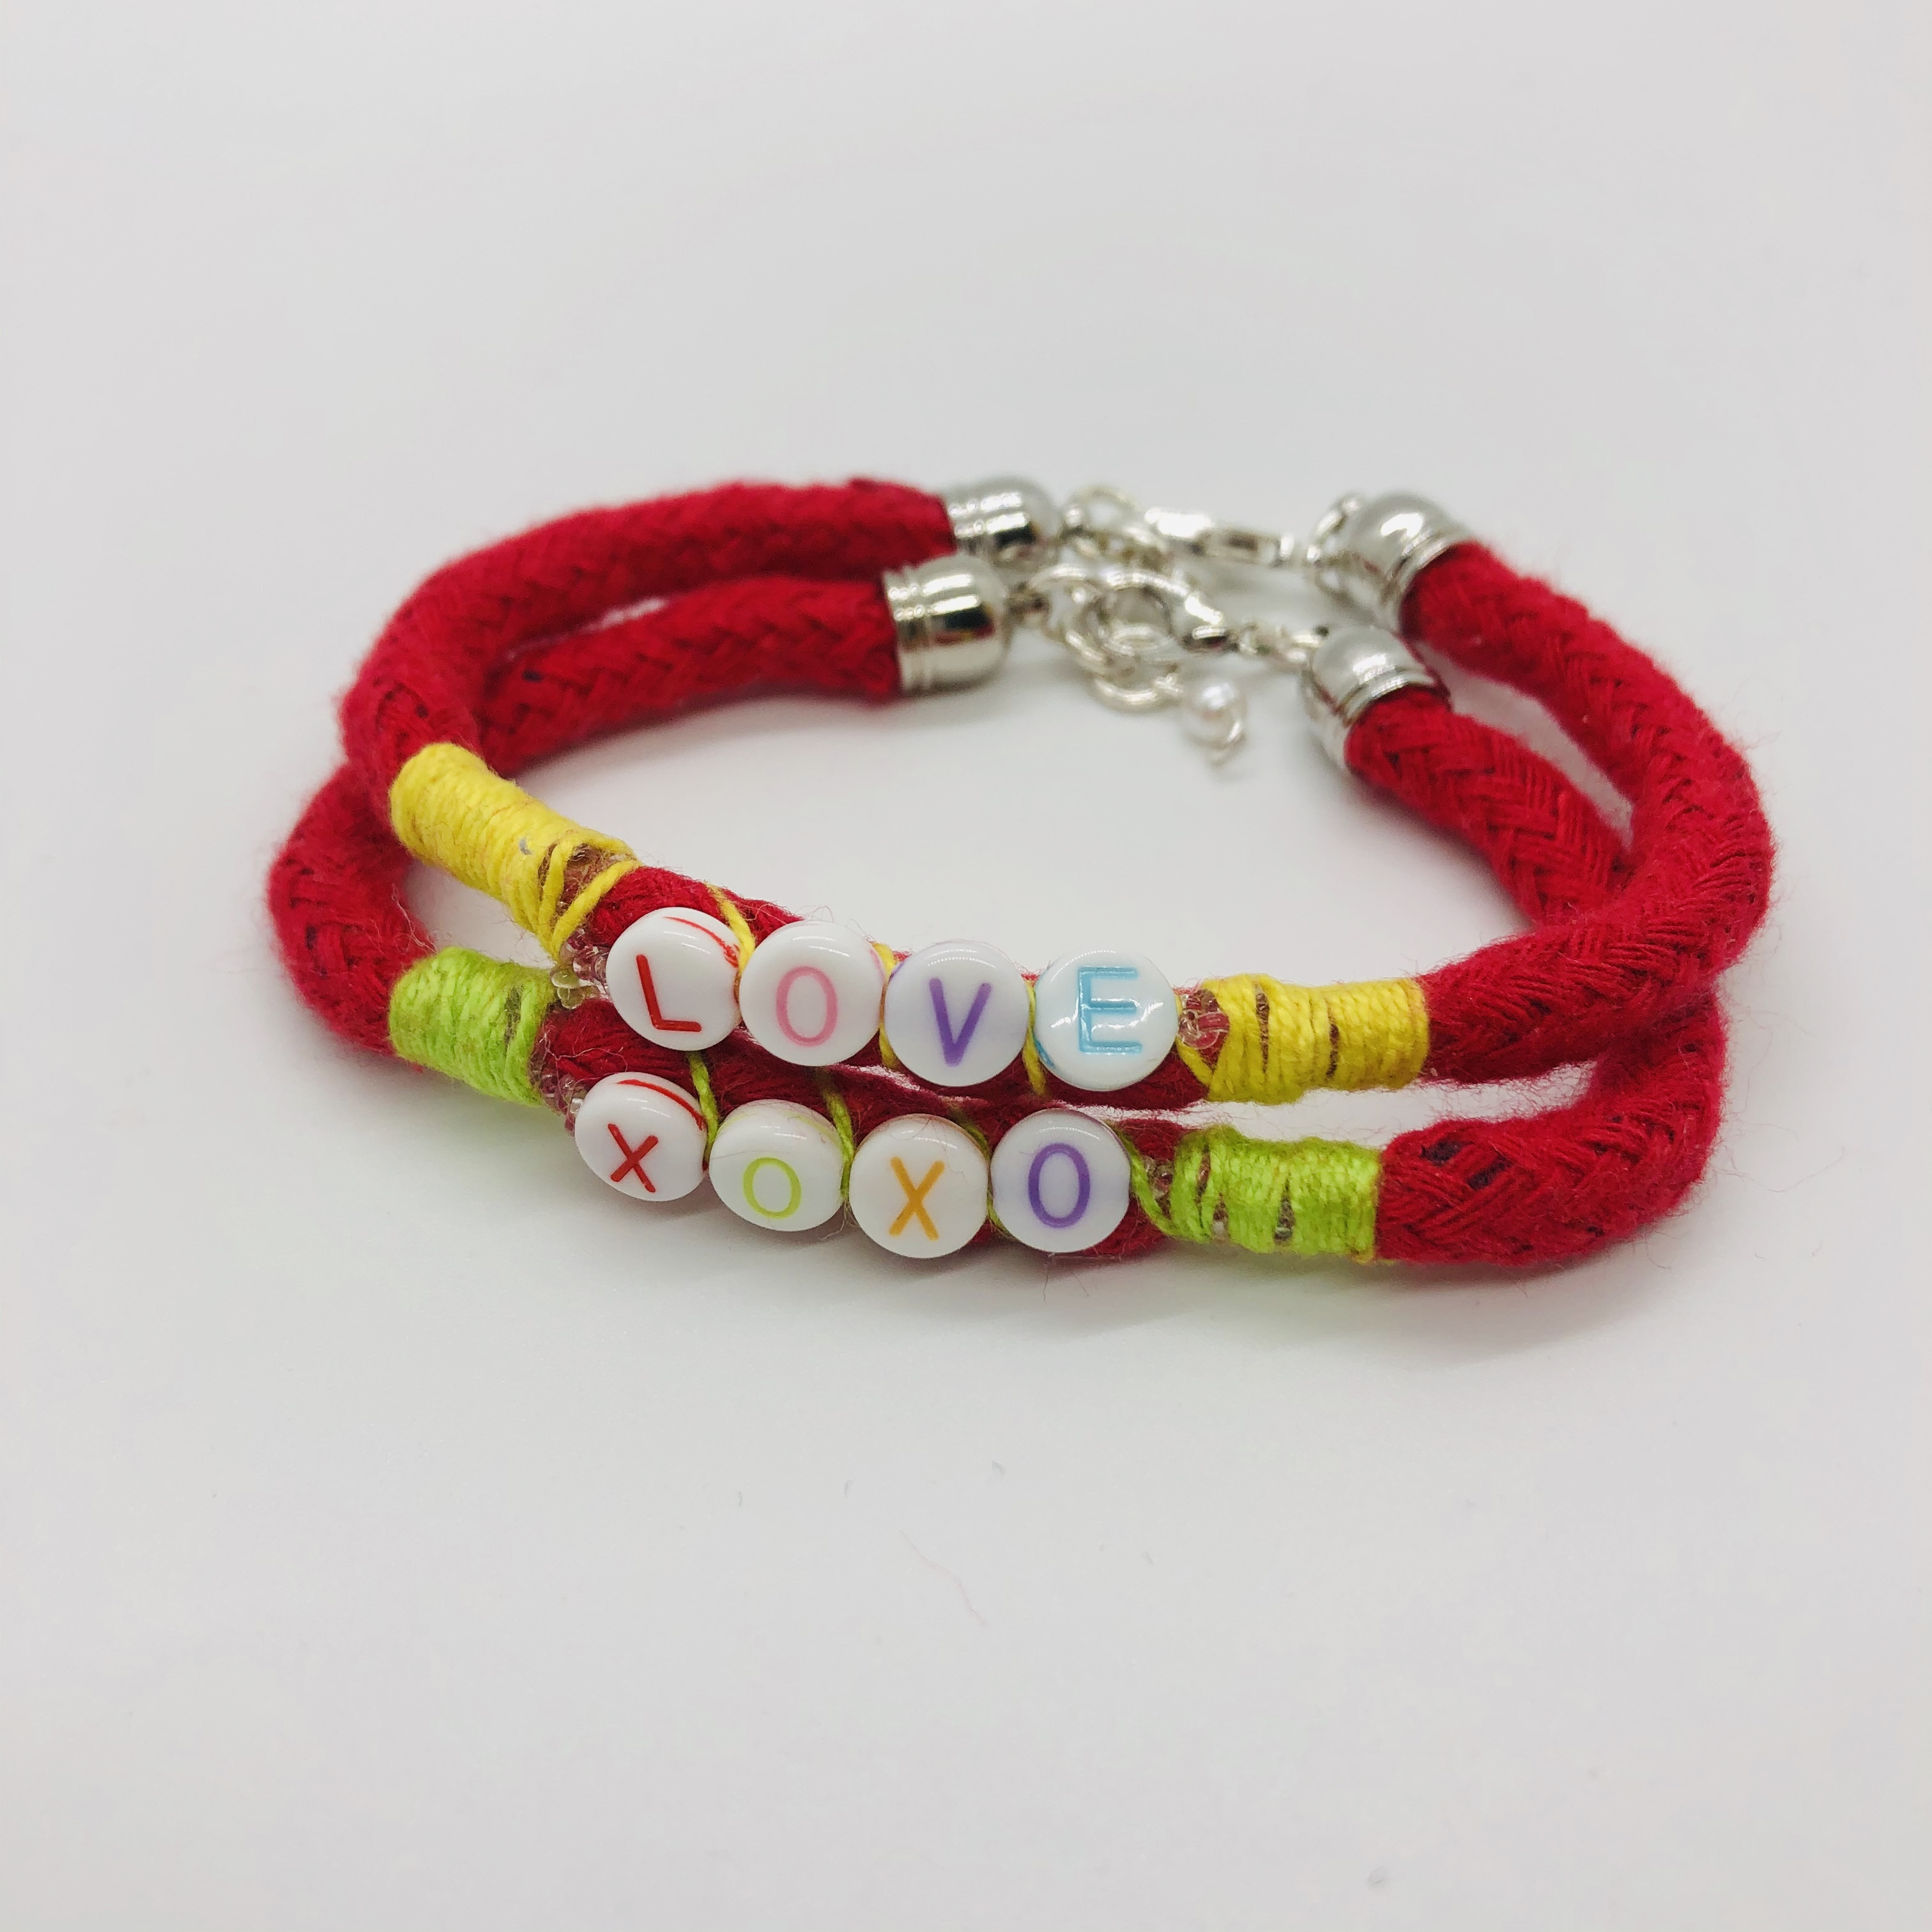 Positive Vibes Bracelets set of 2. Love and XOXO.